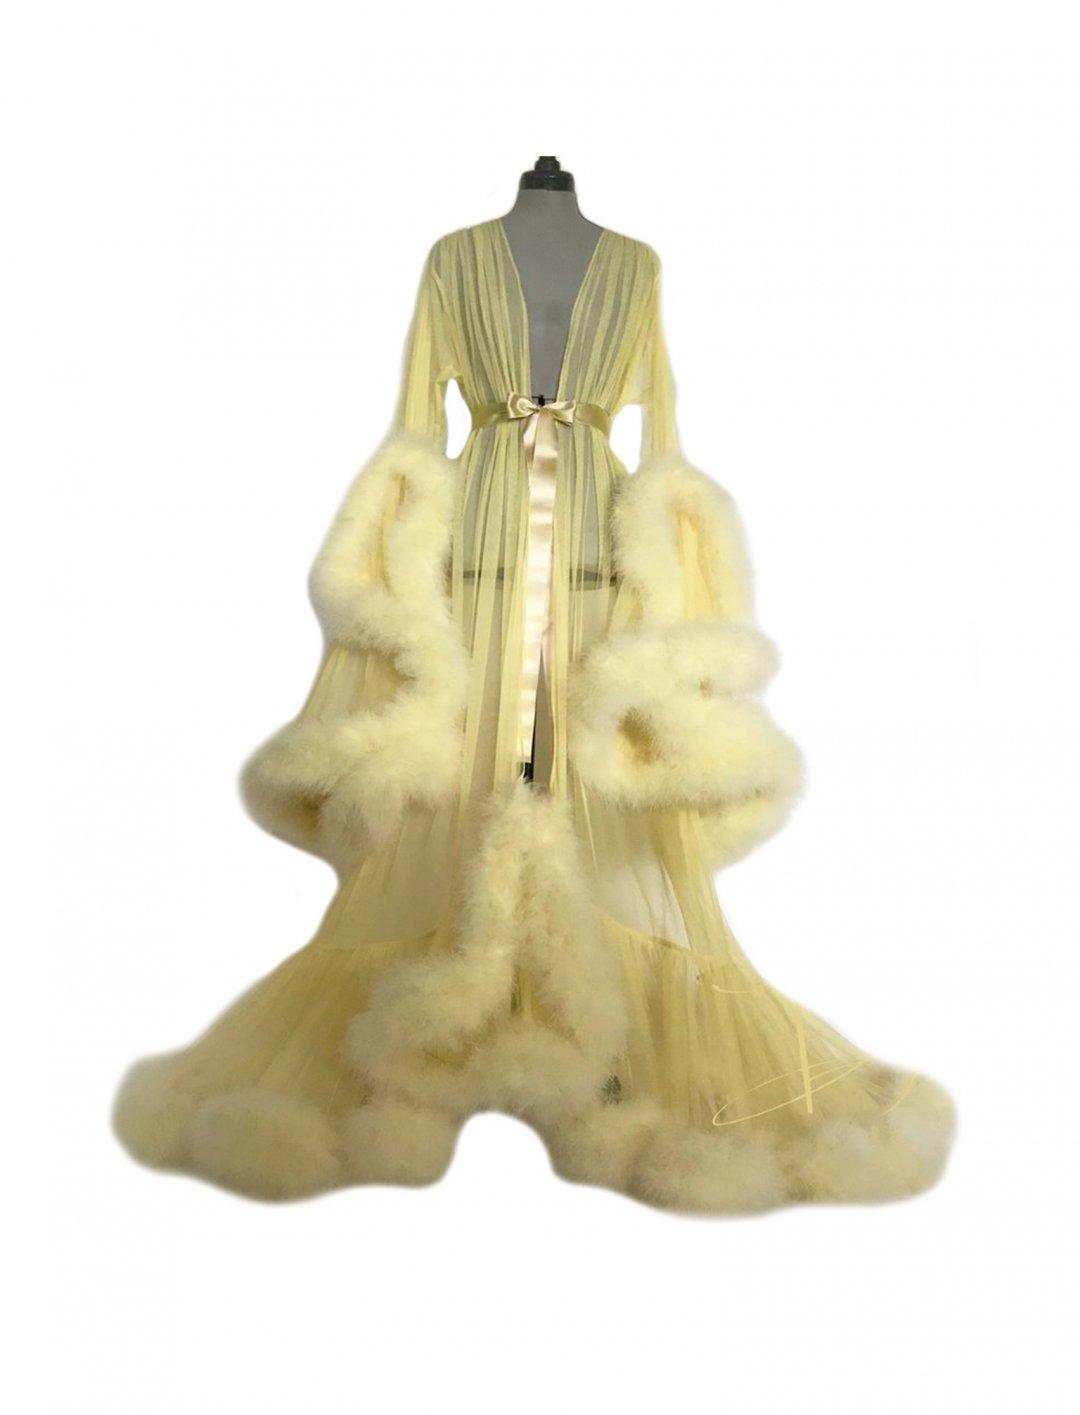 Zara Larsson's Dressing Gown Clothing Boudoir by D'Lish